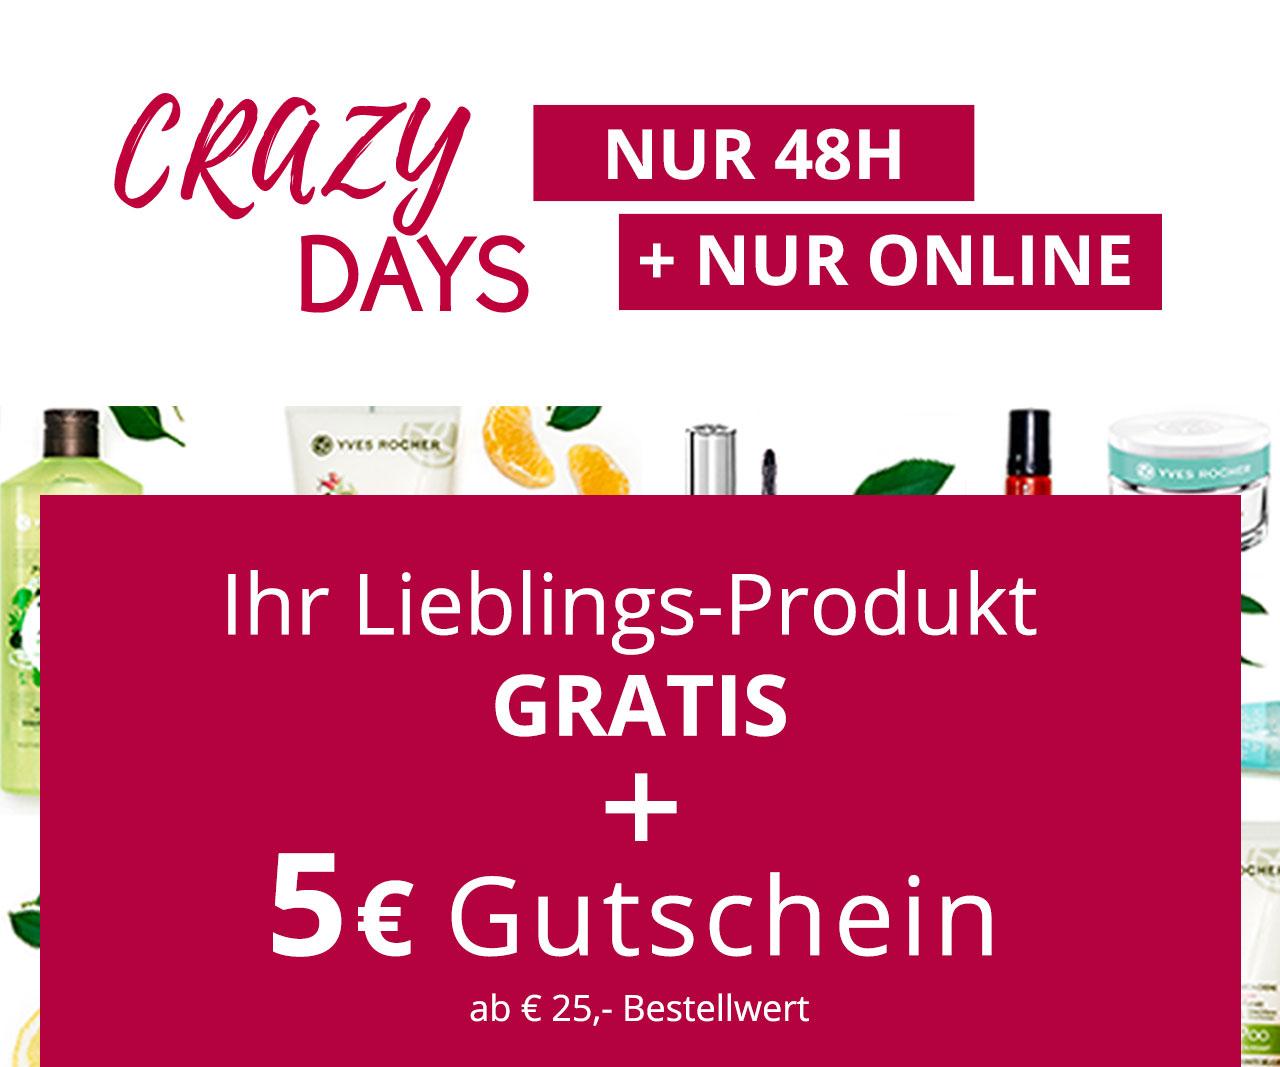 [Yves Rocher] Erstes Produkt im Warenkorb gratis + vsk-frei ab MBW 20€ + GS 5€ ab MBW 25€